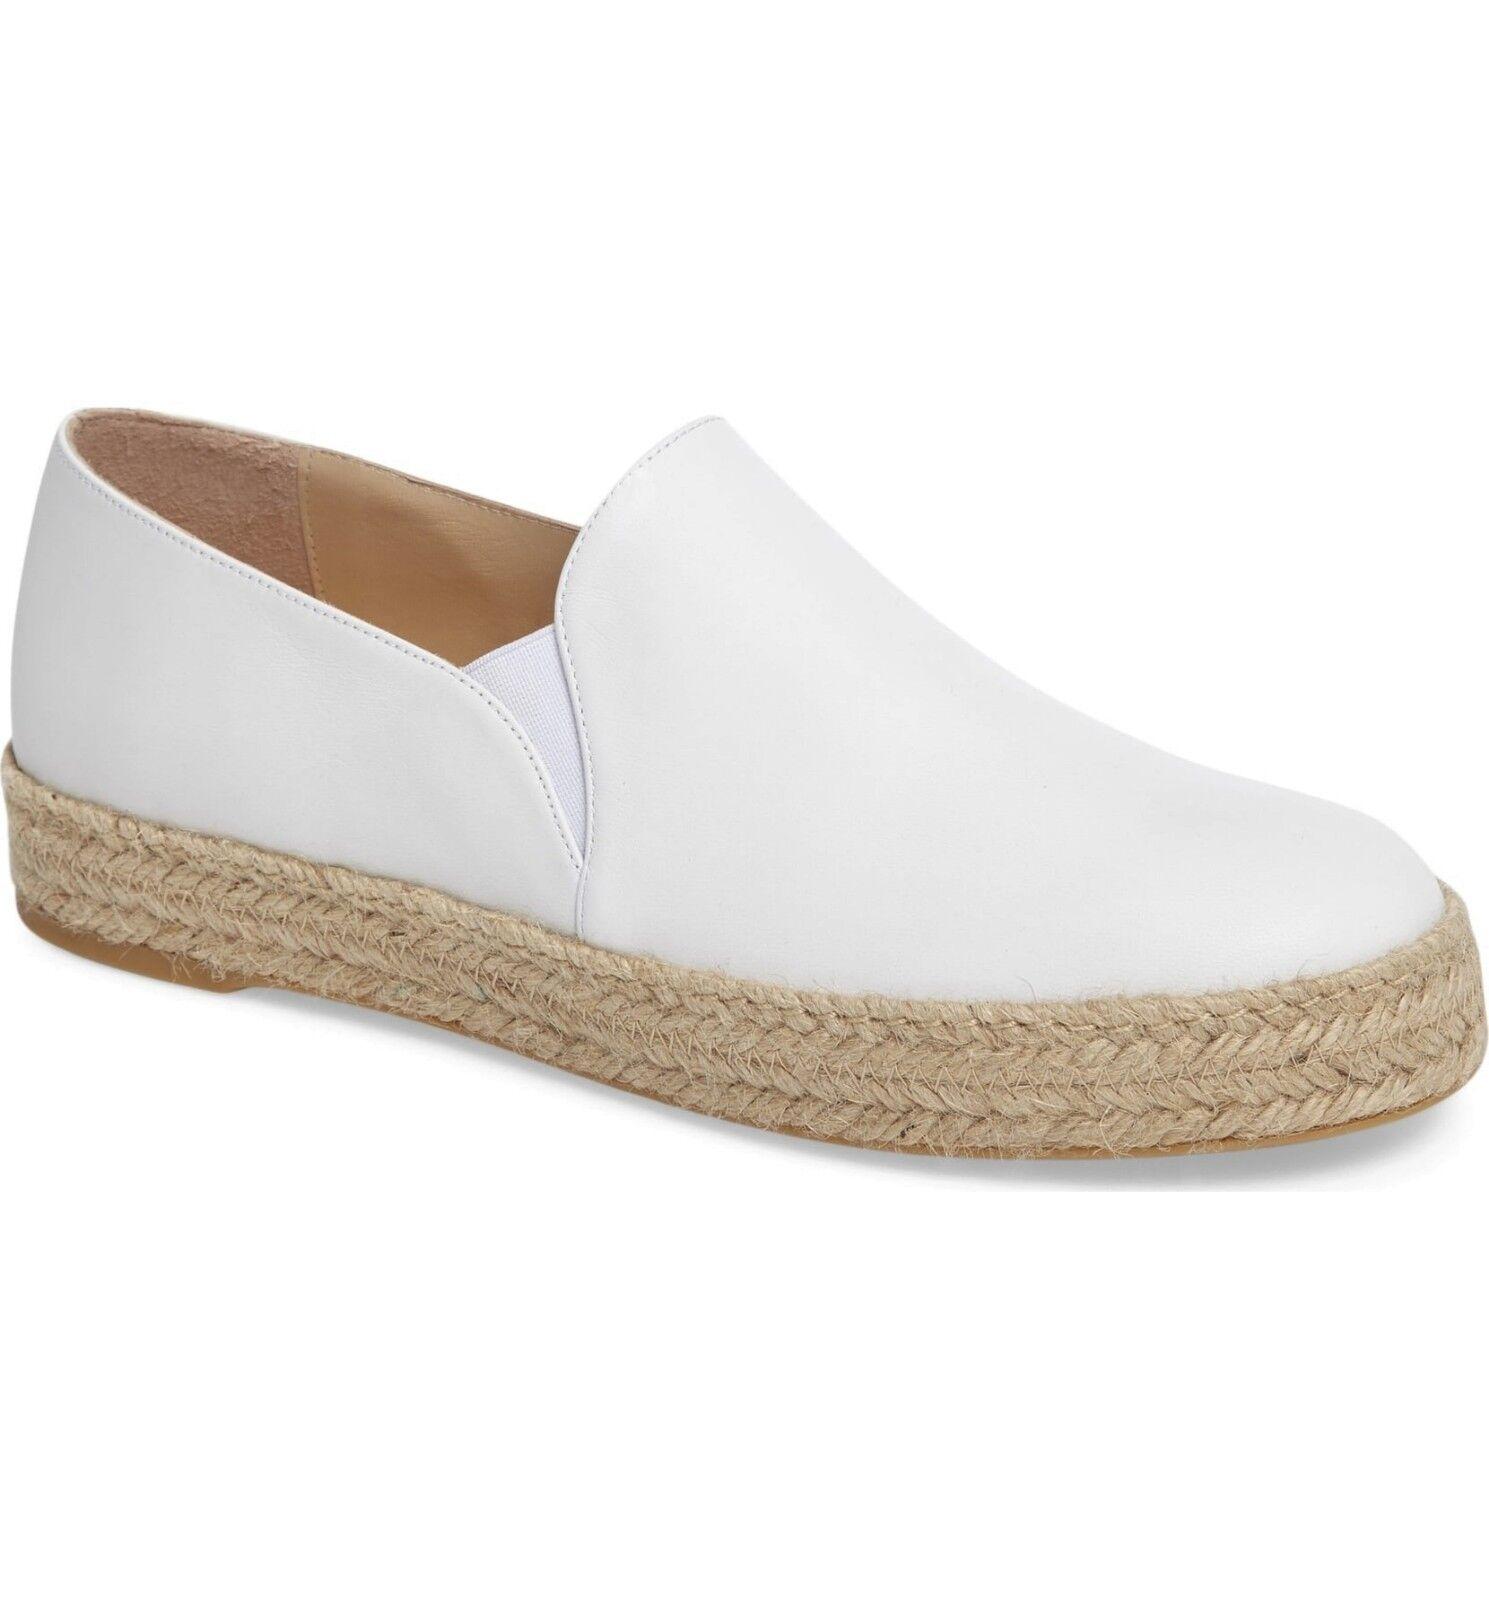 Stuart Weitzman Nugal White Nappa Size 8 Espadrille Slip On Sneaker Flats